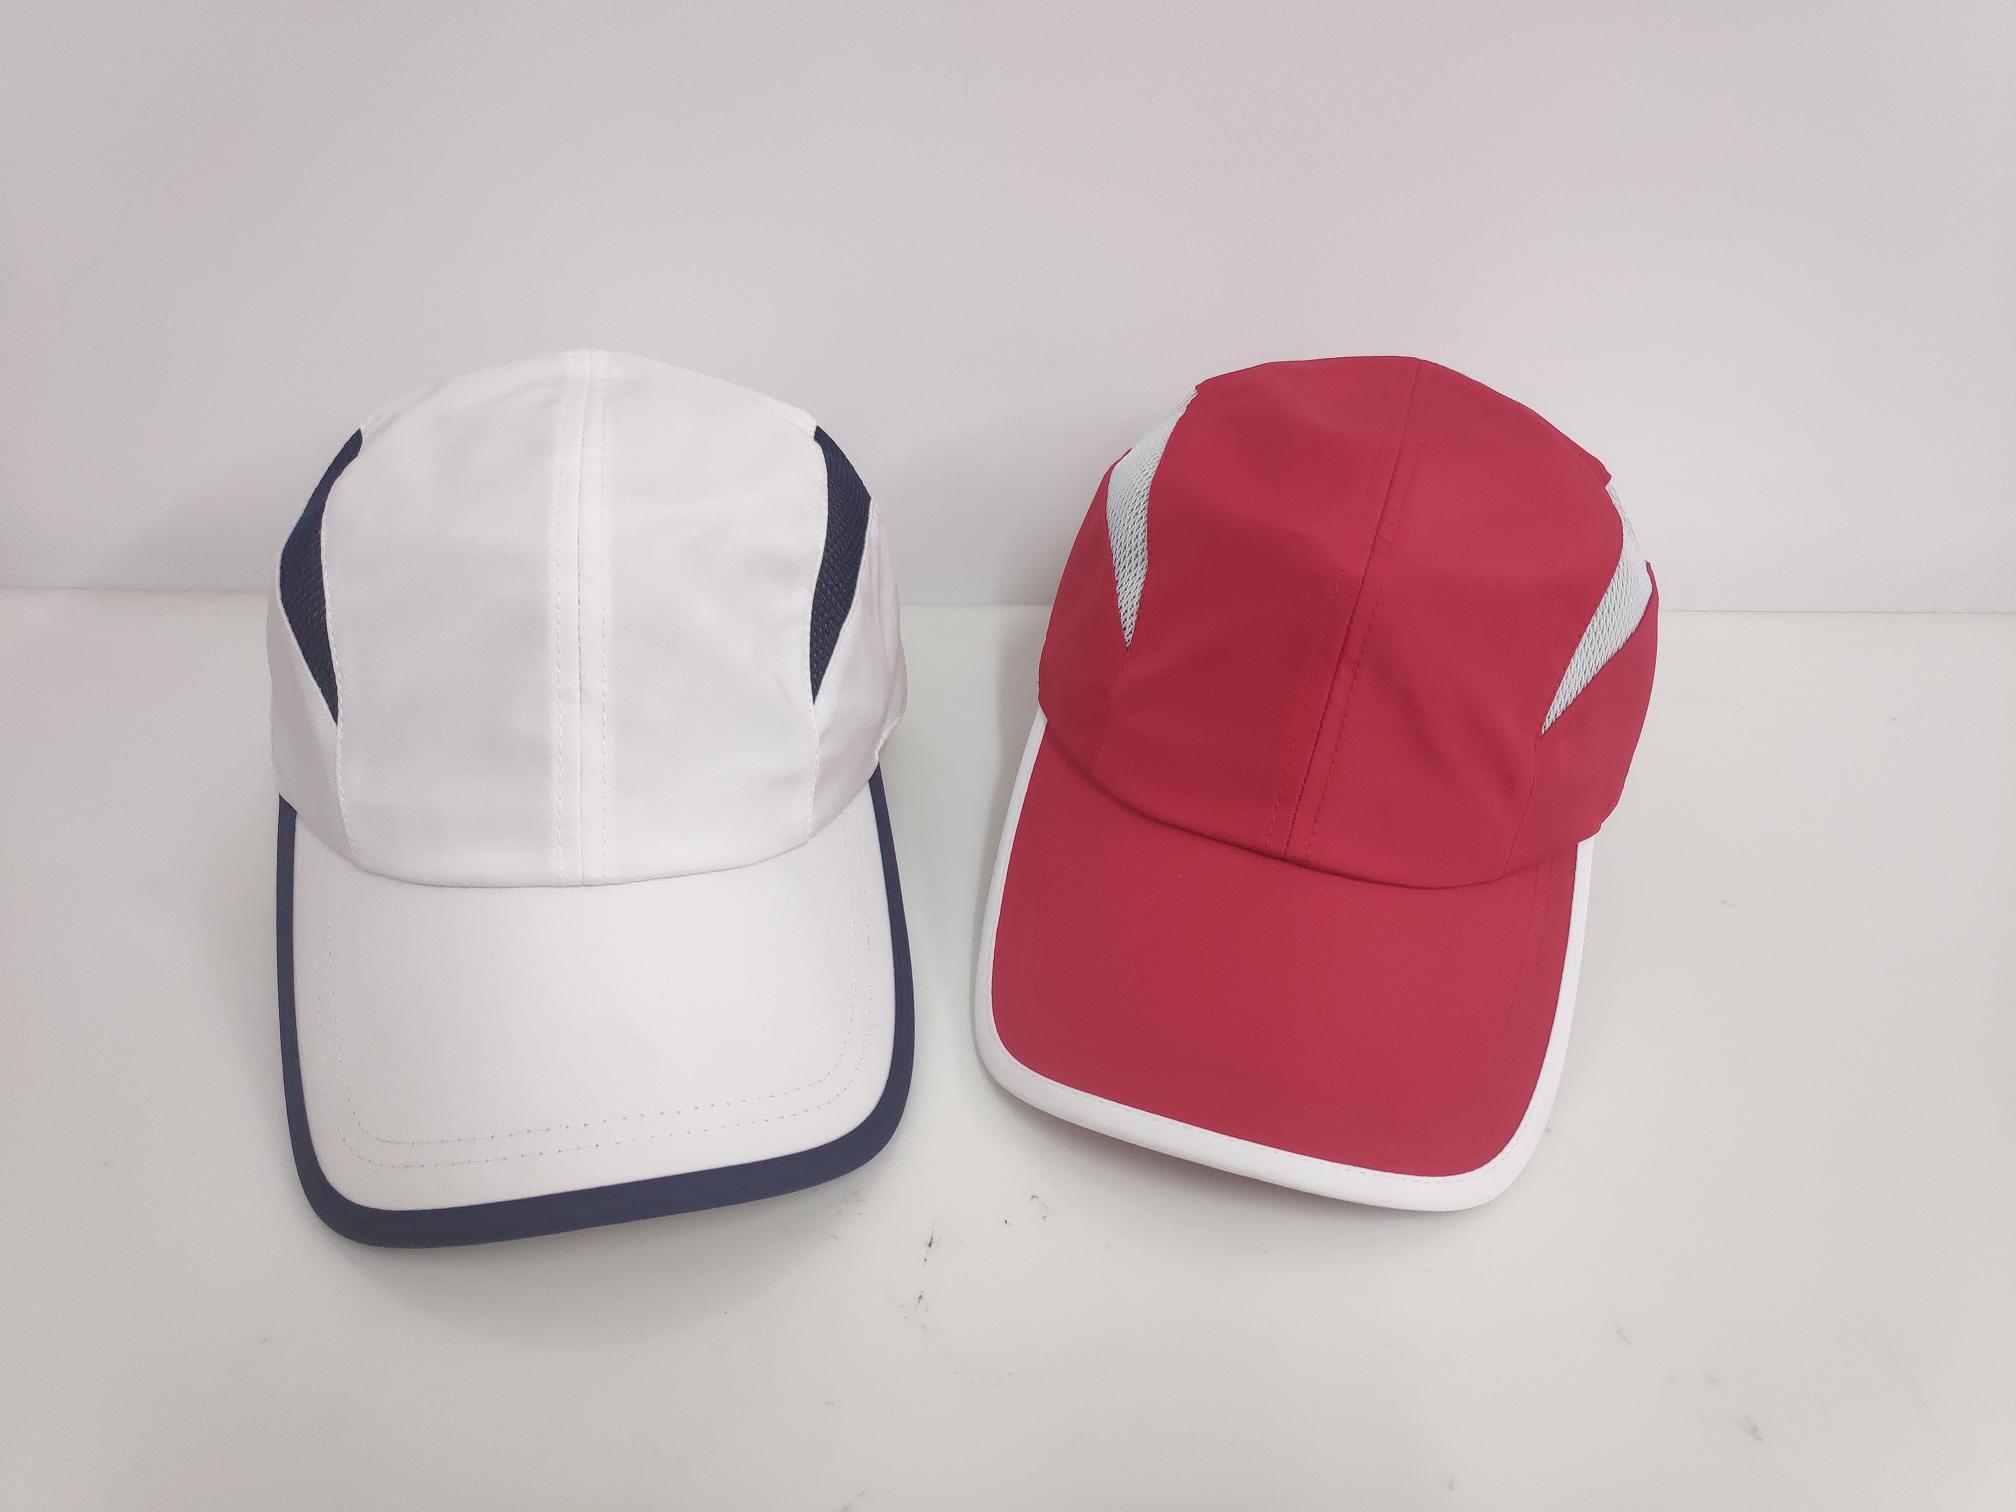 Polyester Micro fiber Jockey 6panel Gorras baseball cap 2